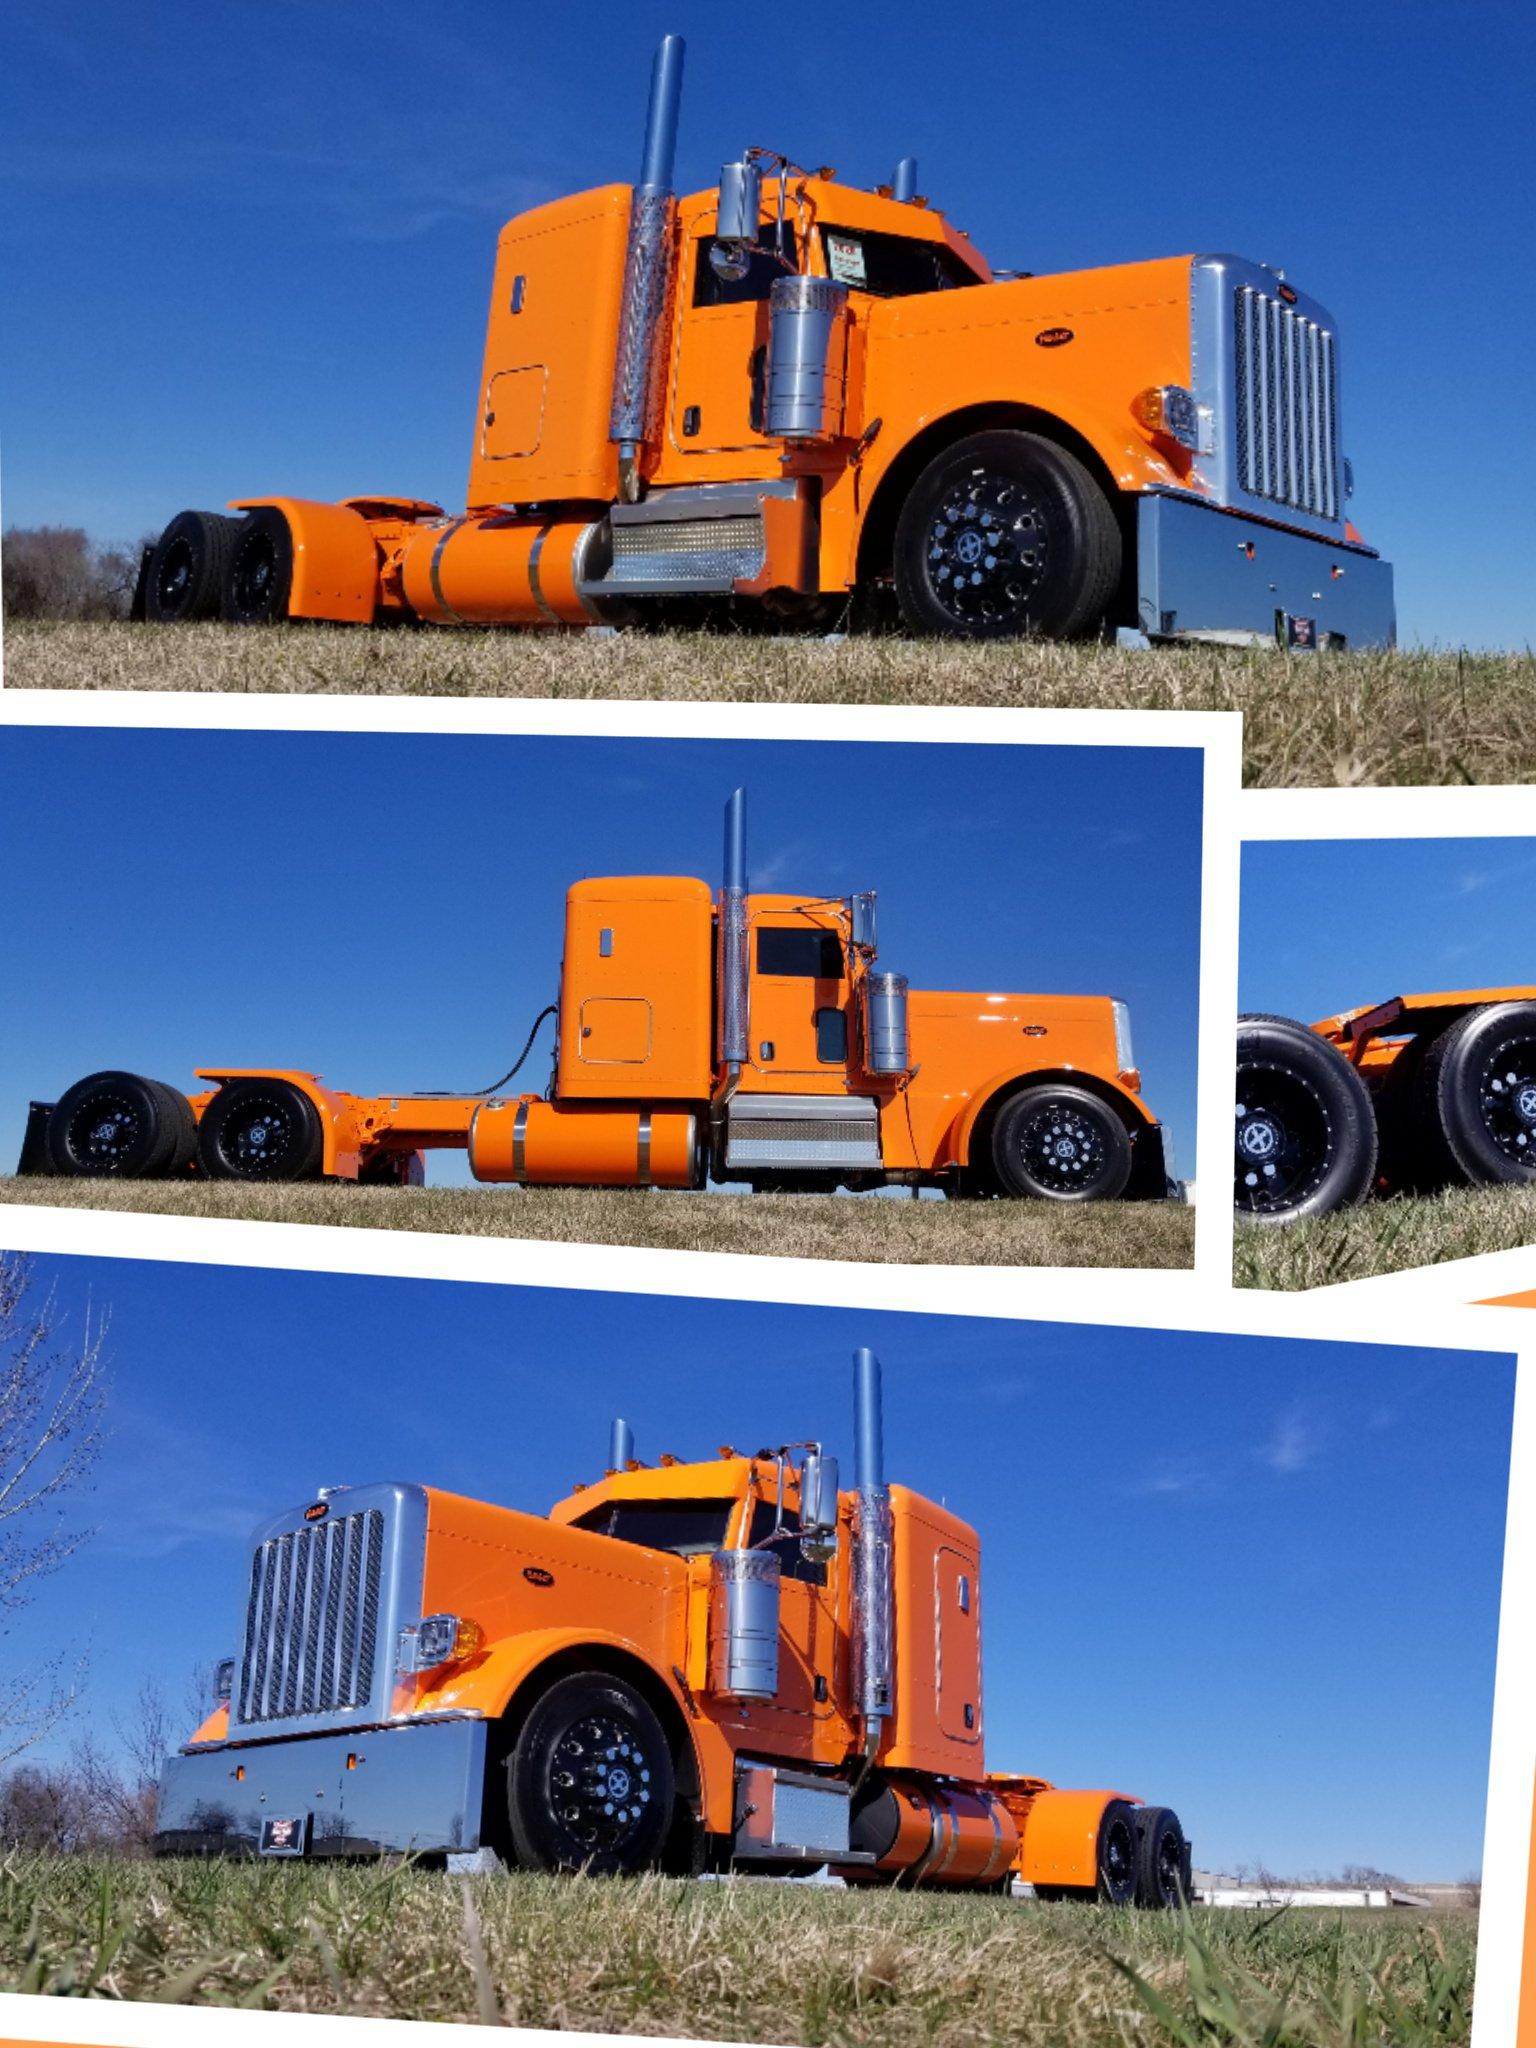 The Ultimate Peterbilt 389 Truck Photo Collection   389 Peterbilt Show Trucks